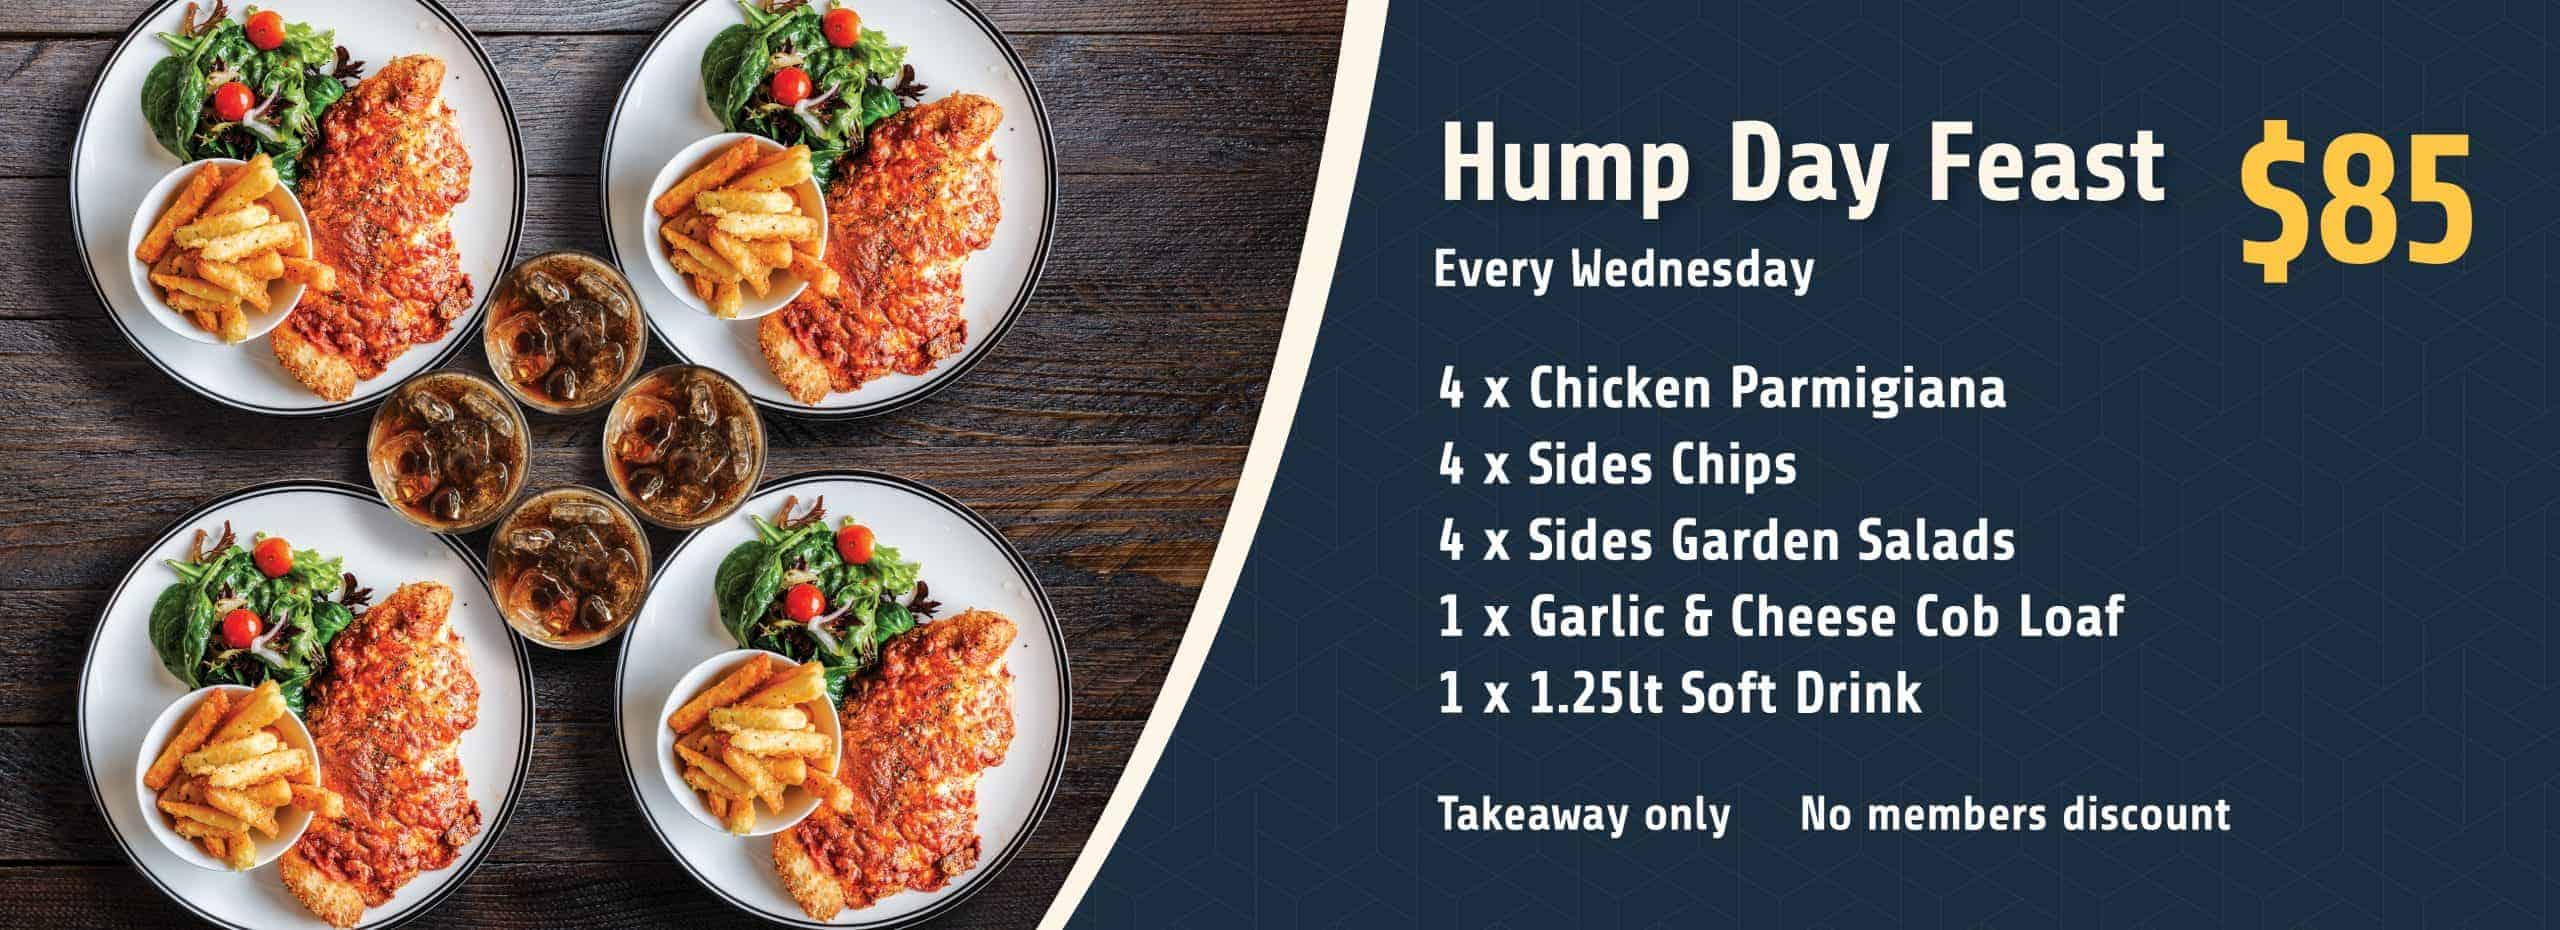 MBC0921-04 Hump Day Feast - WEB BANNER